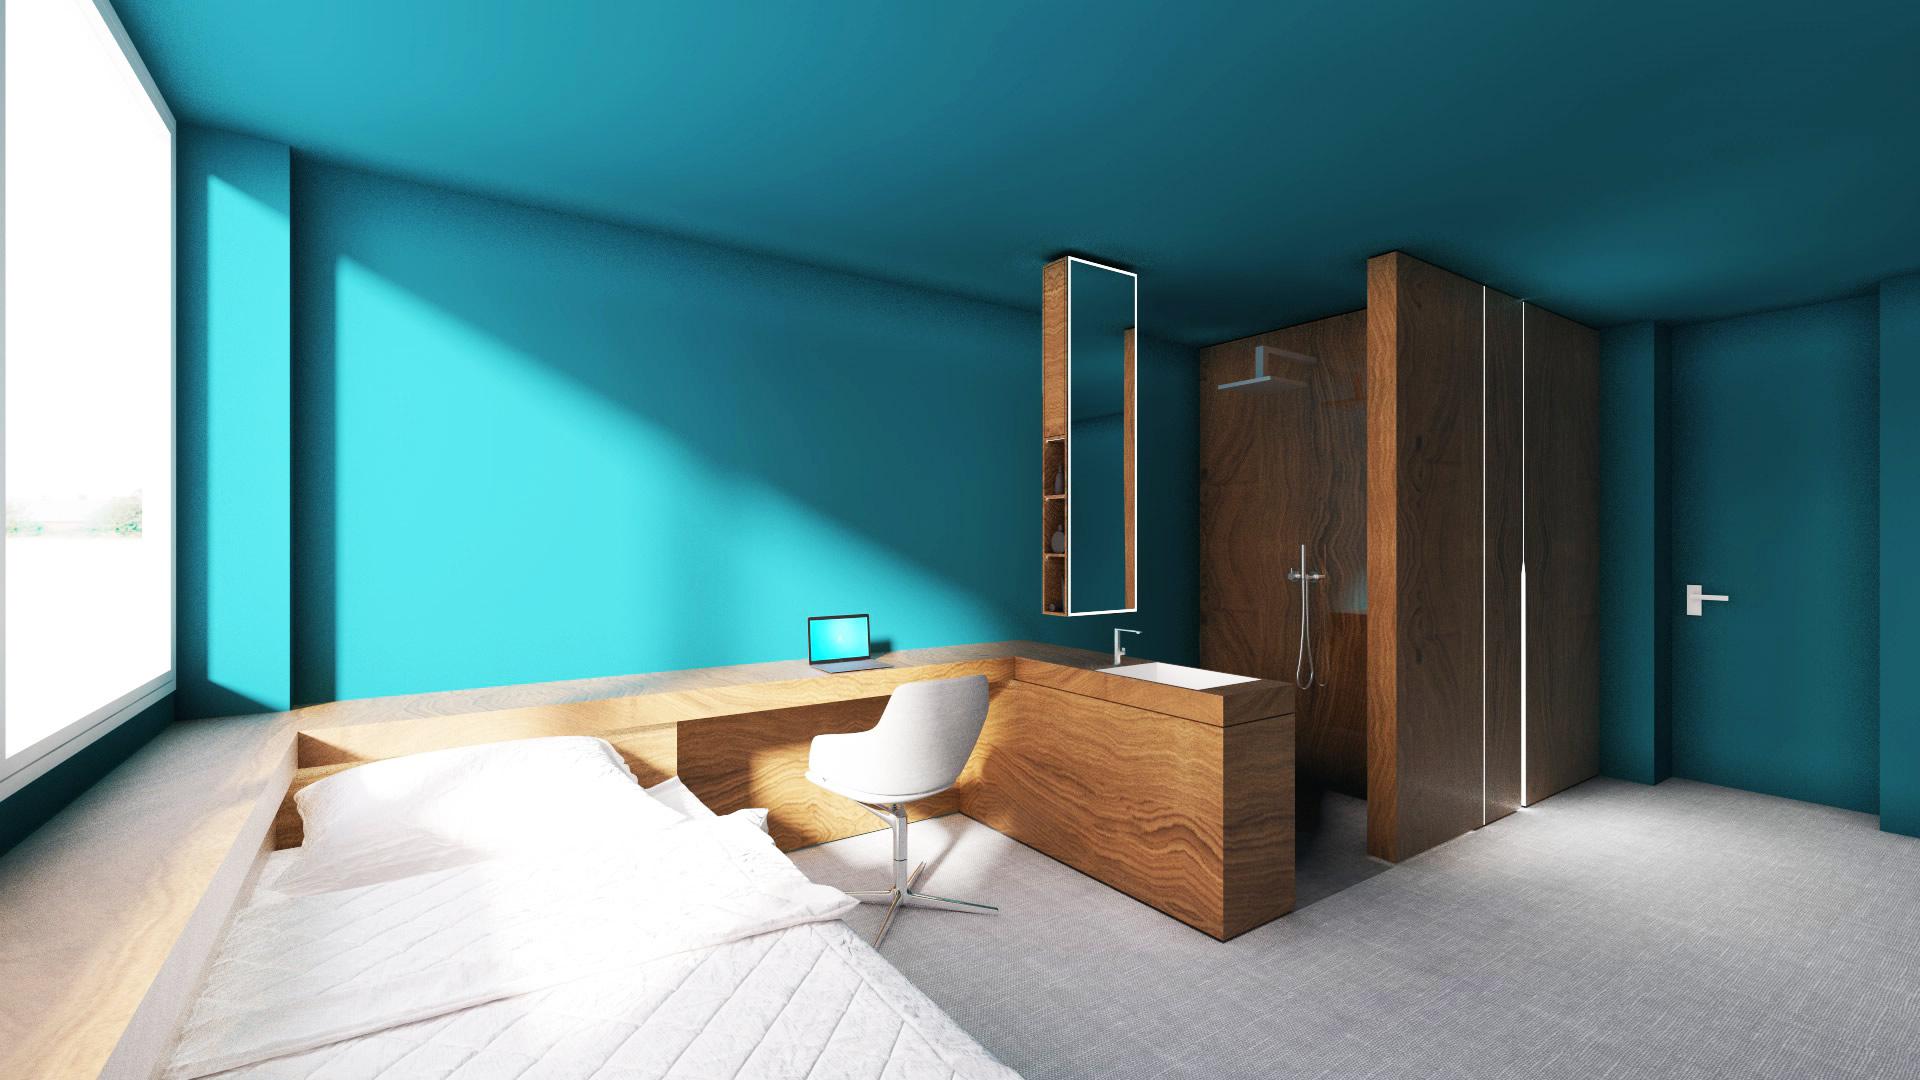 whocares_design_hotel_material-6